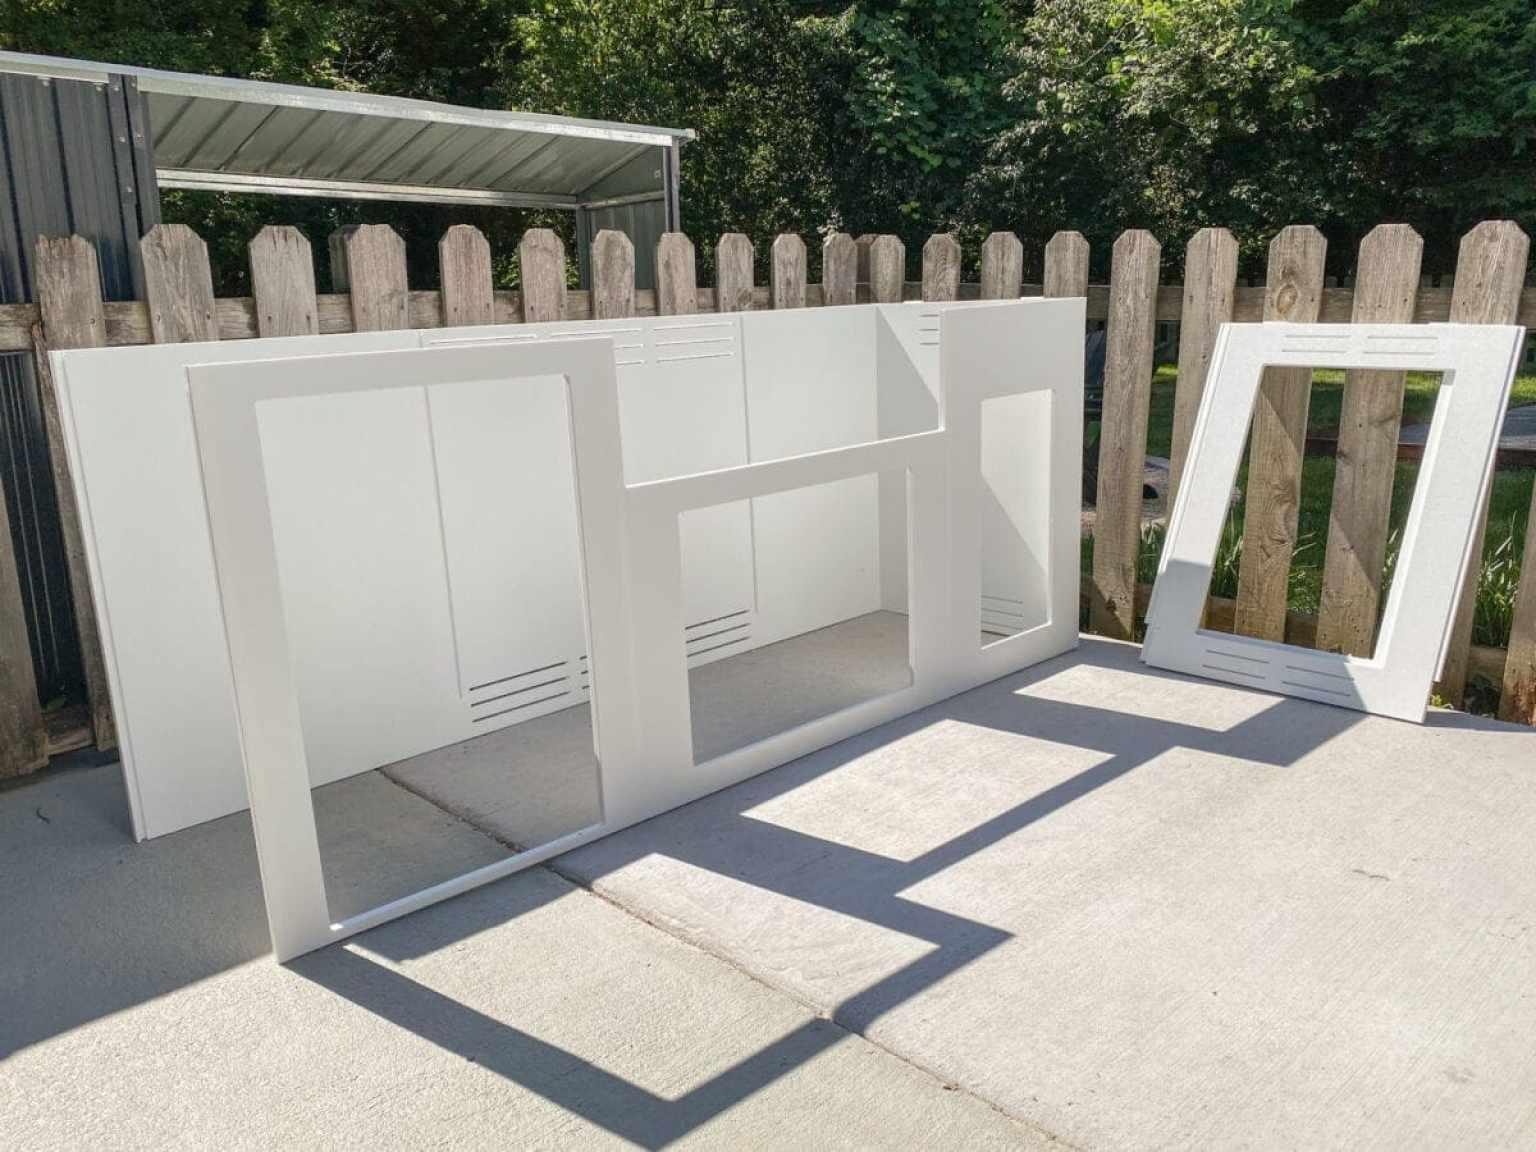 building a modular outdoor kitchen frame